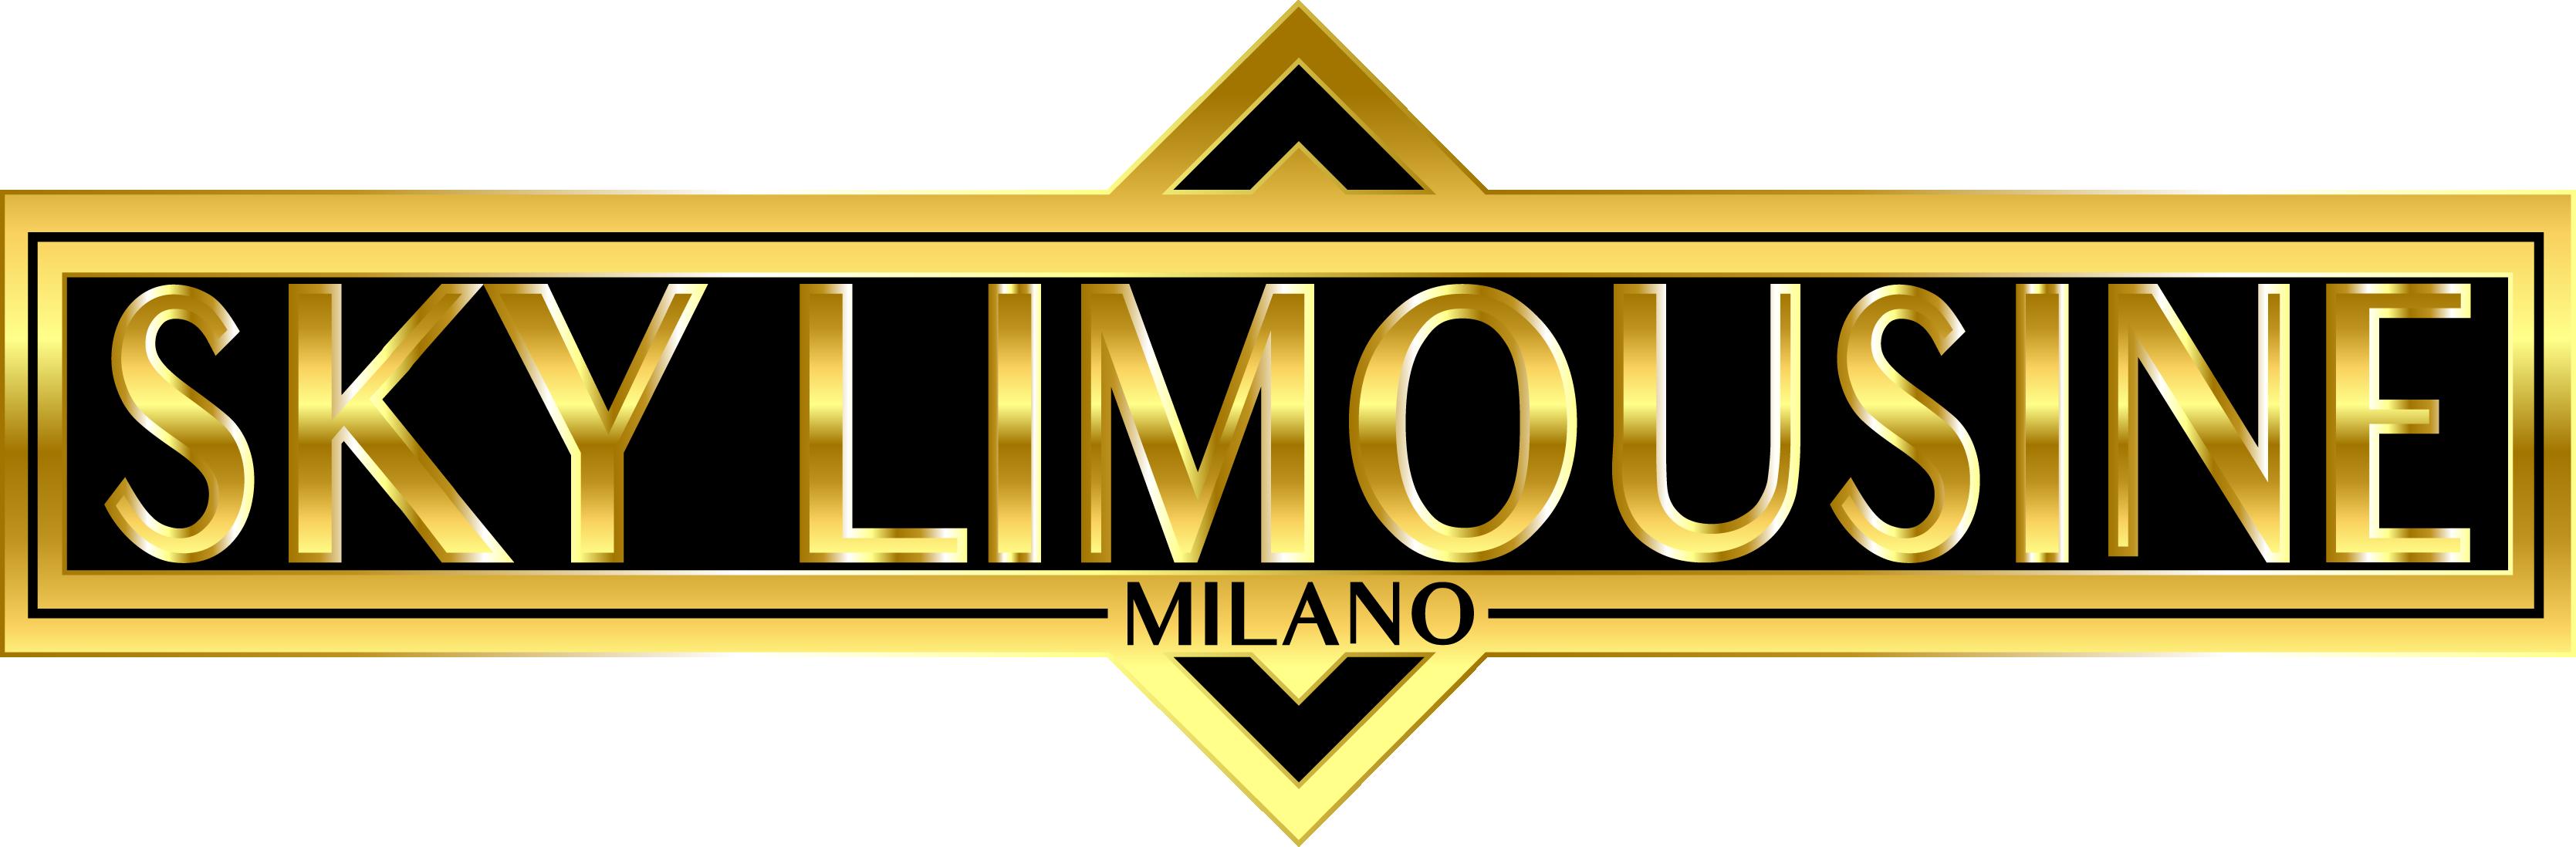 Sky Limousine Milano